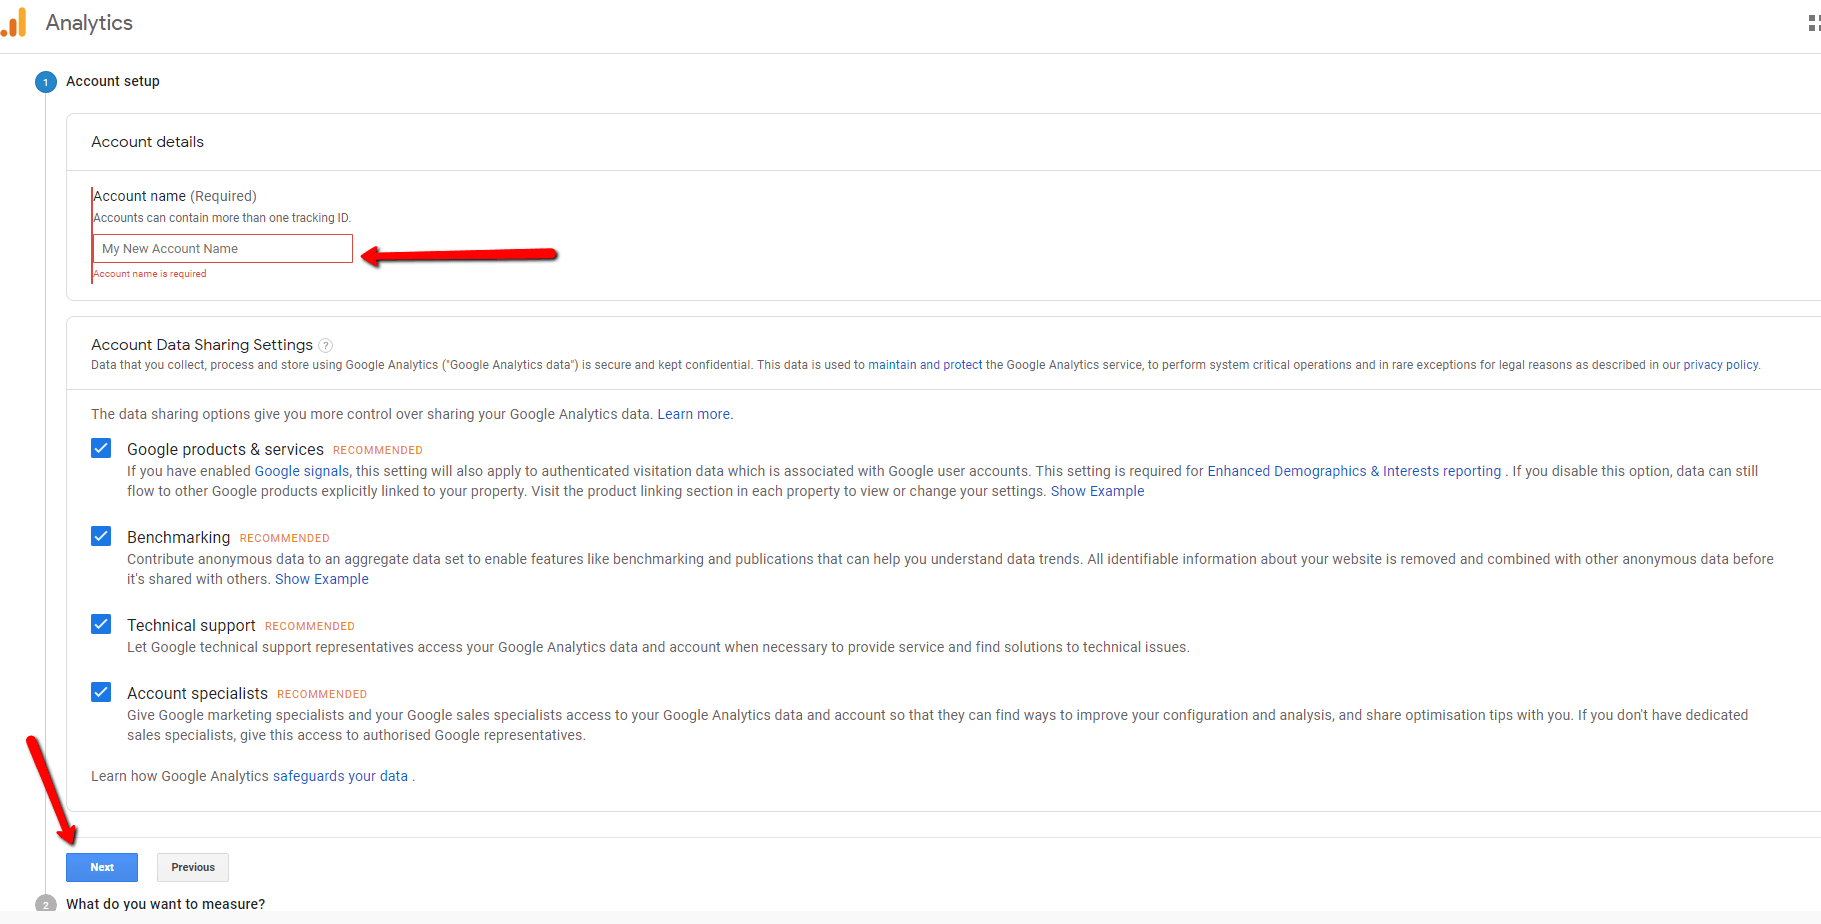 Google Analytics Account Set Up